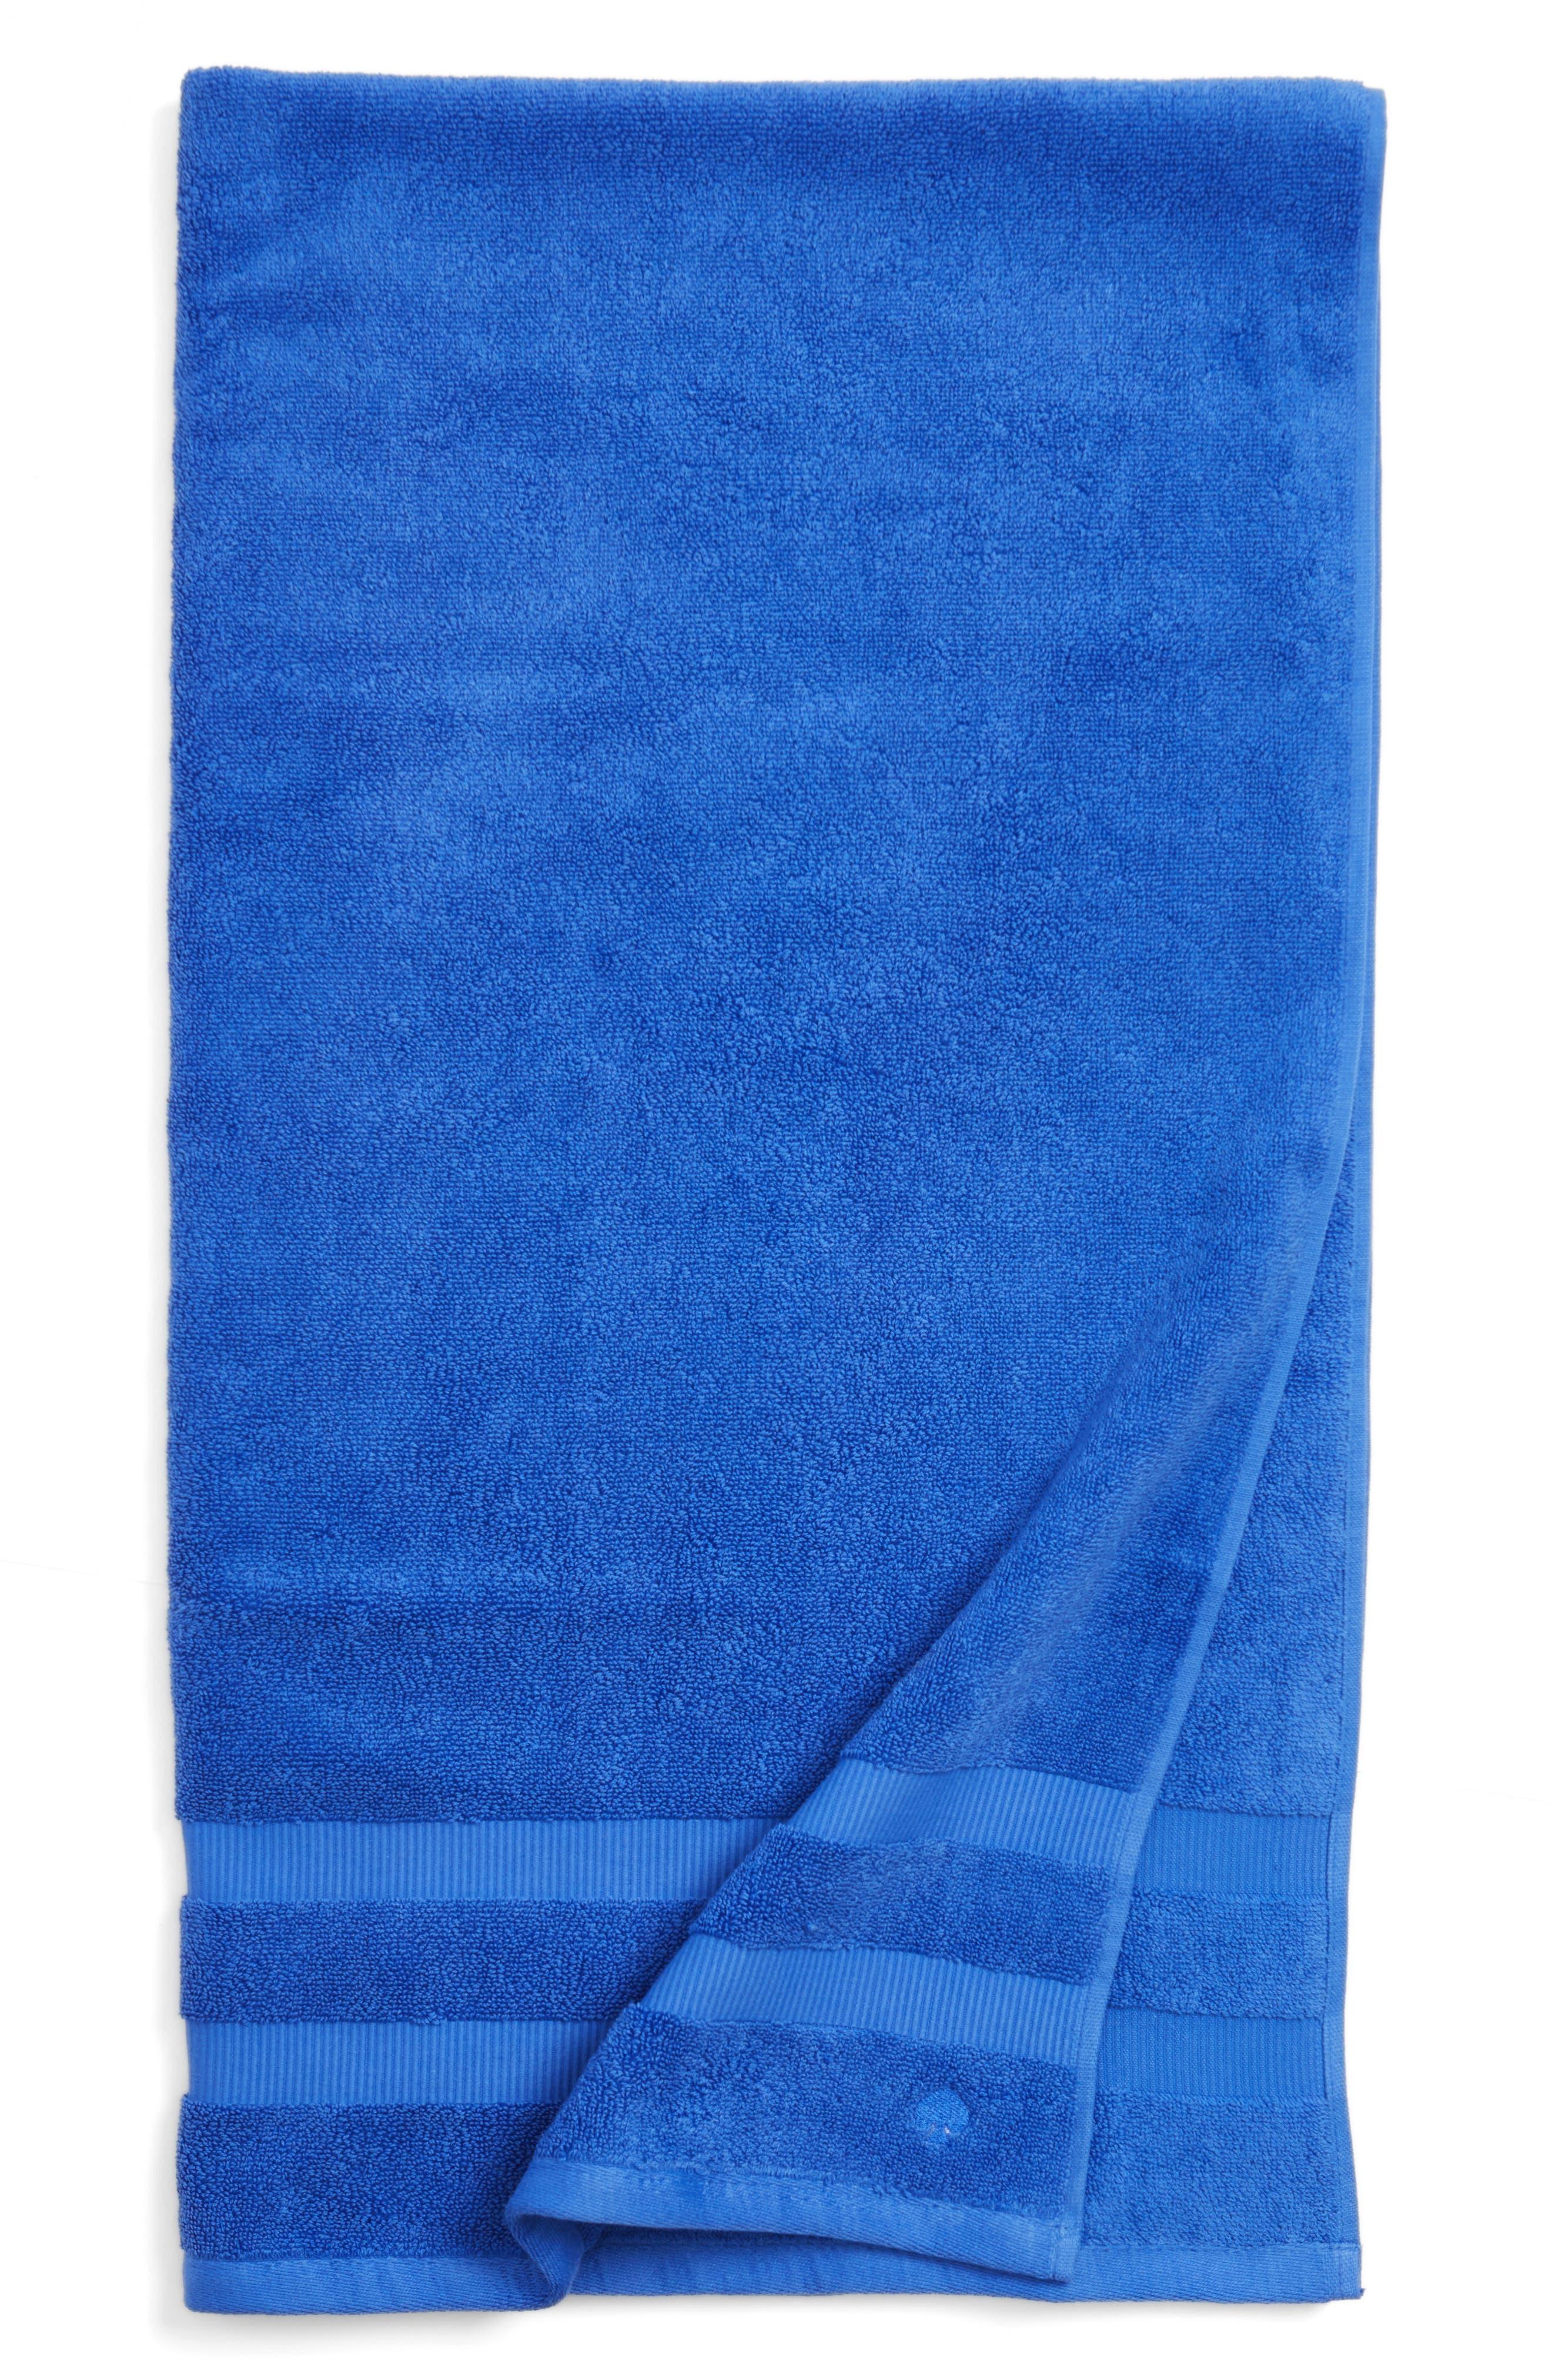 Towel Towel W